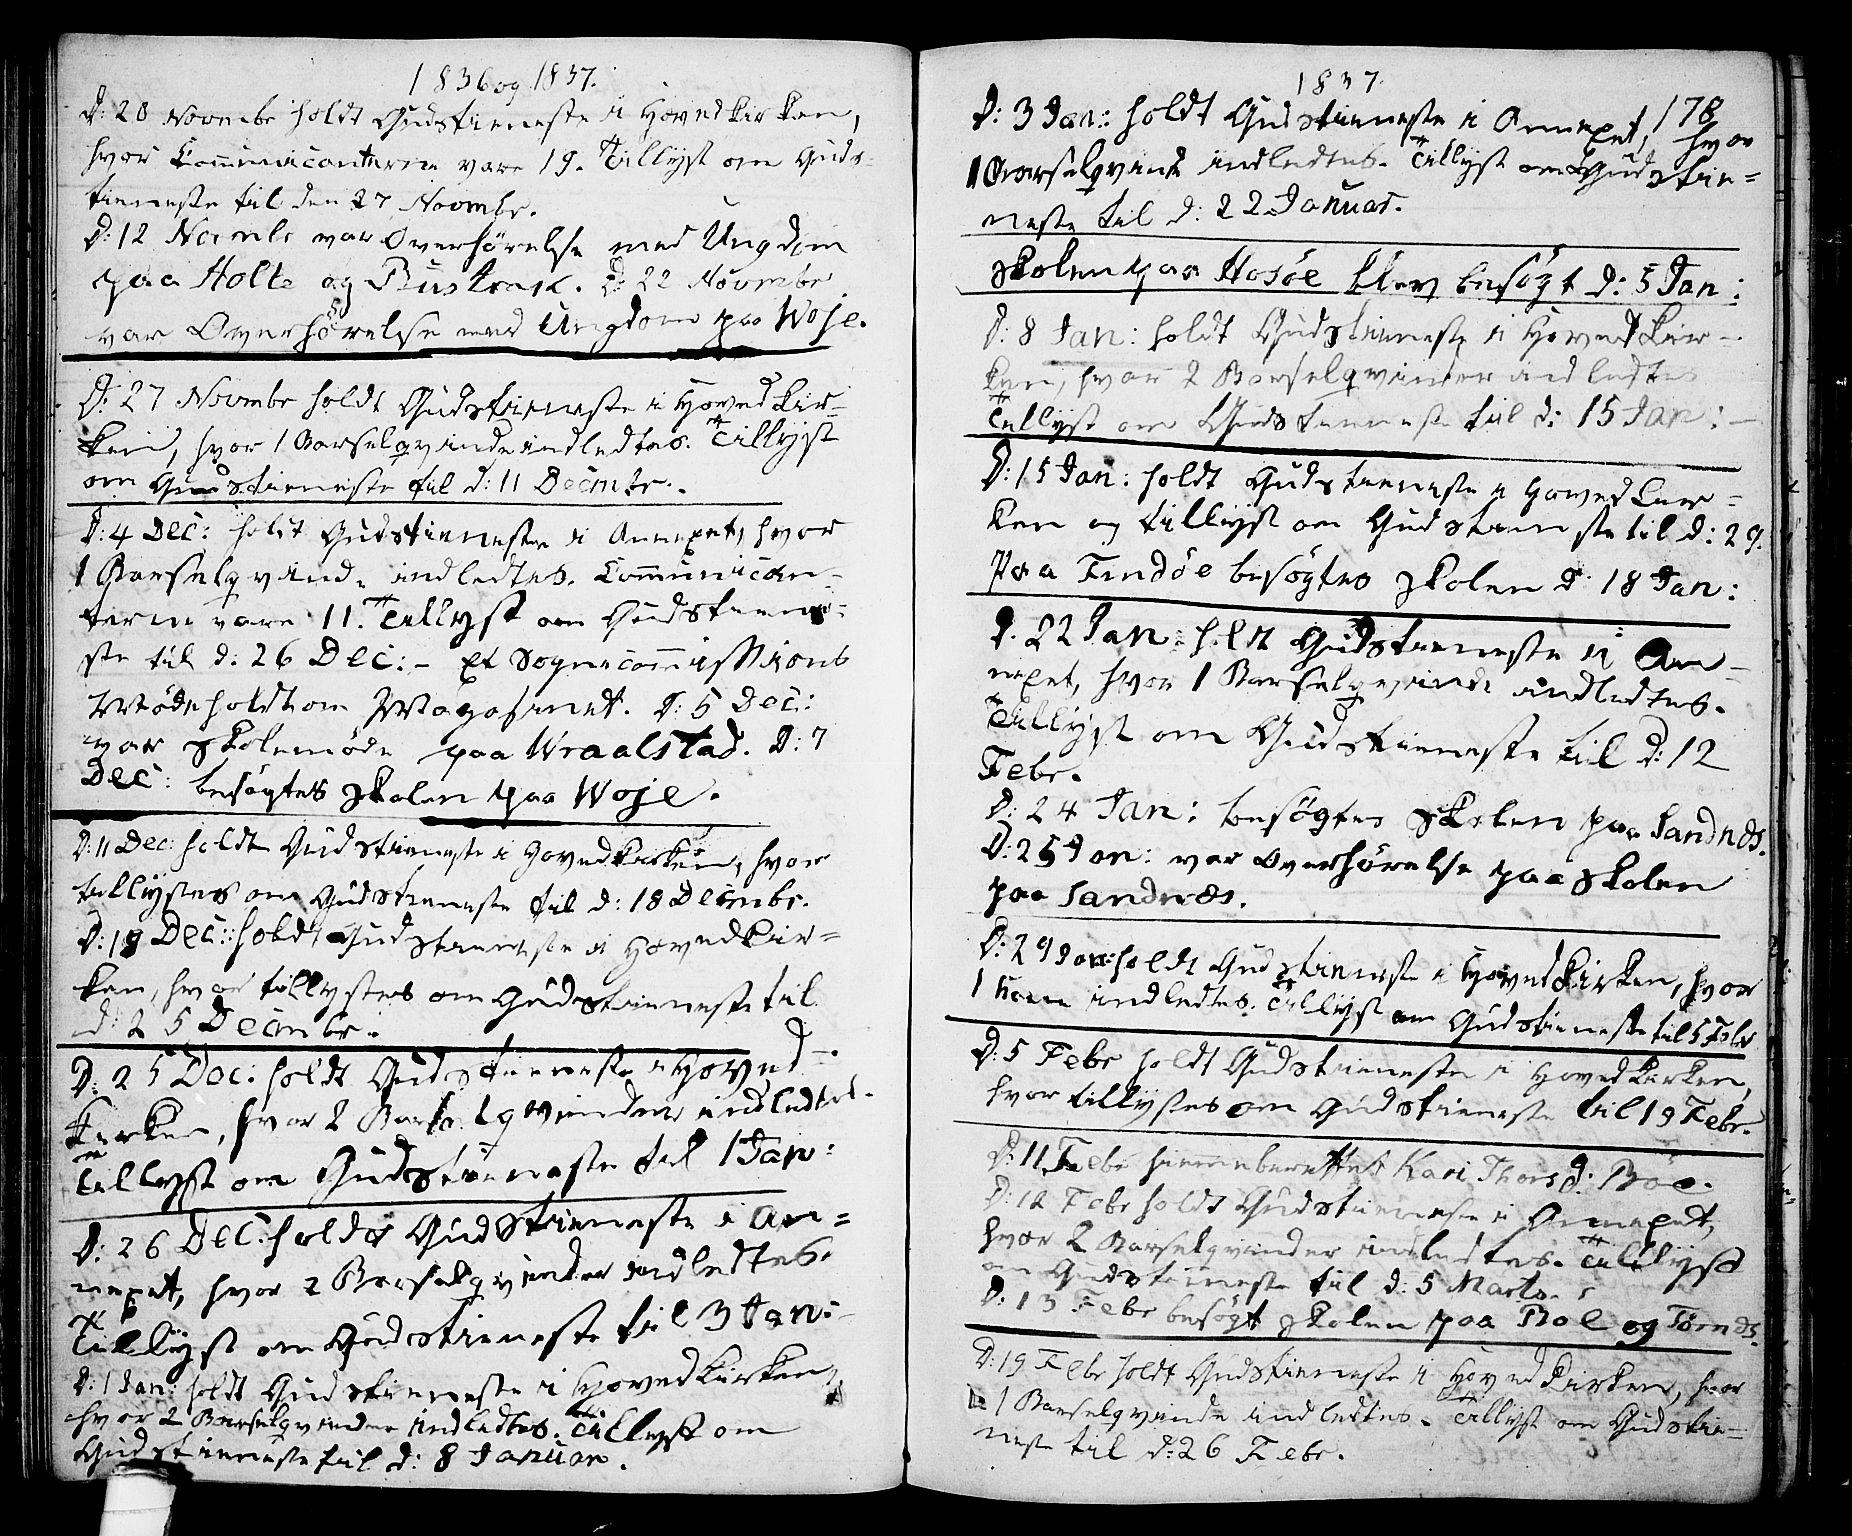 SAKO, Drangedal kirkebøker, F/Fa/L0006: Ministerialbok nr. 6, 1831-1837, s. 178